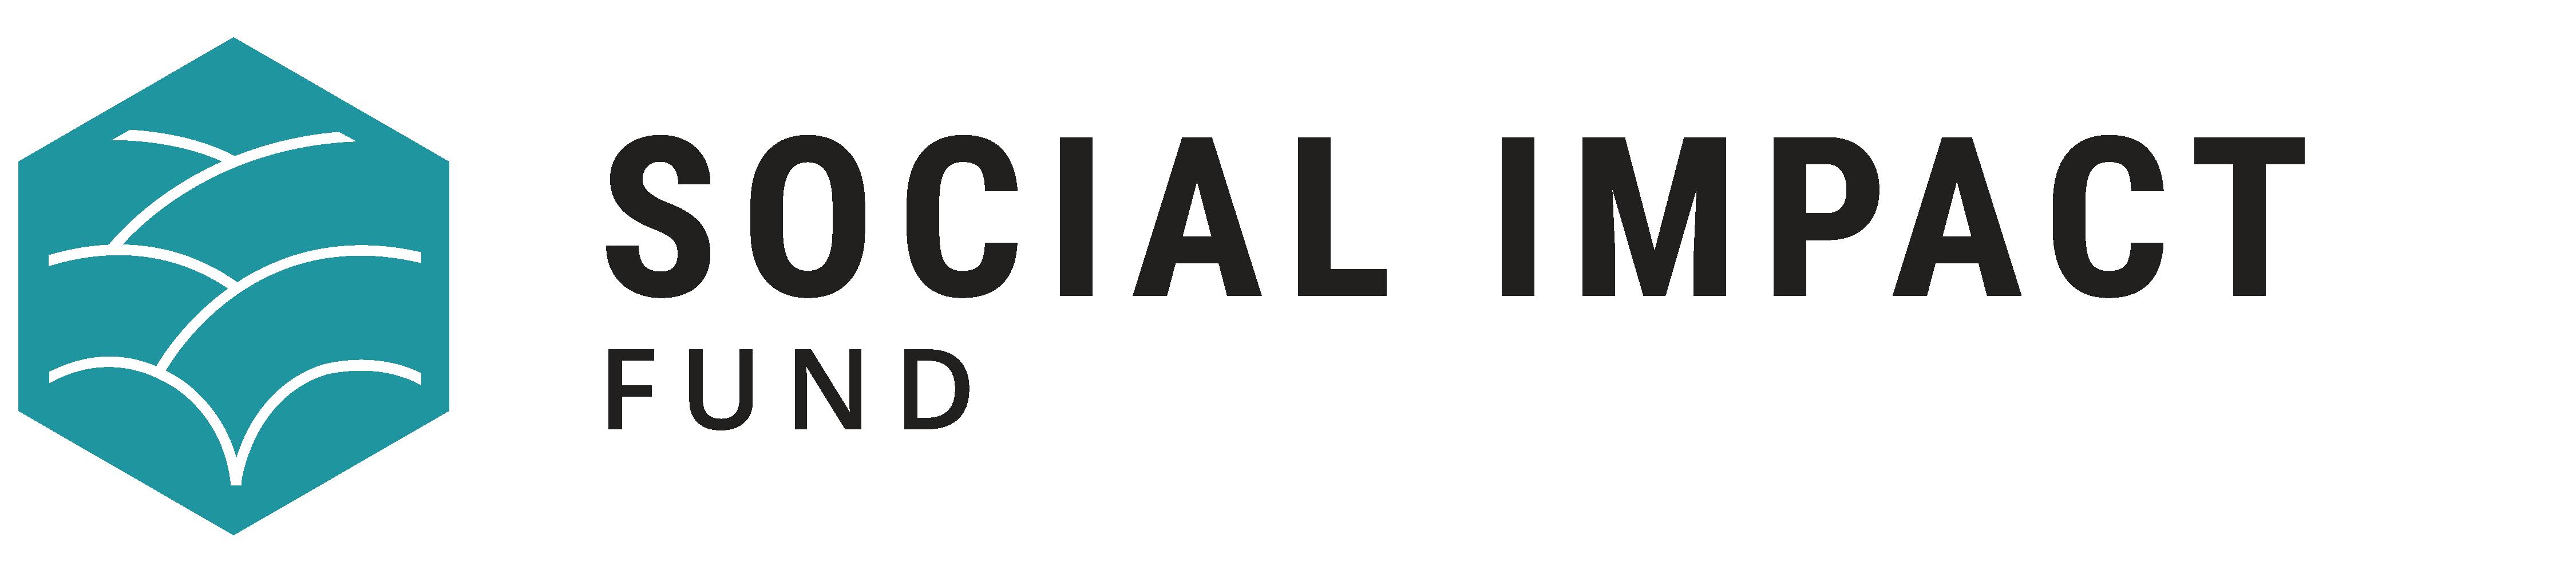 Social Impact Fund | Alumni Ventures Group